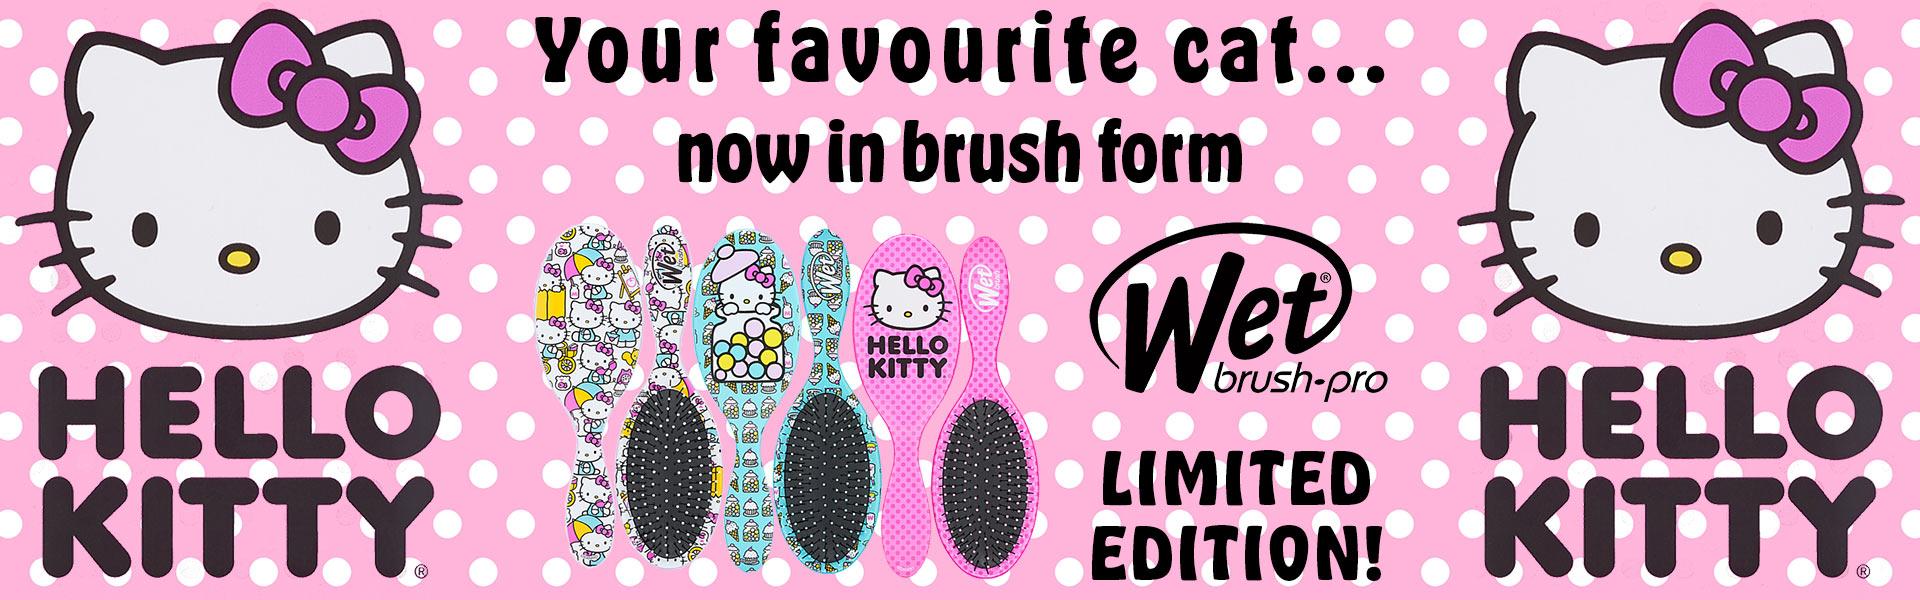 WetBrush Hello Kitty